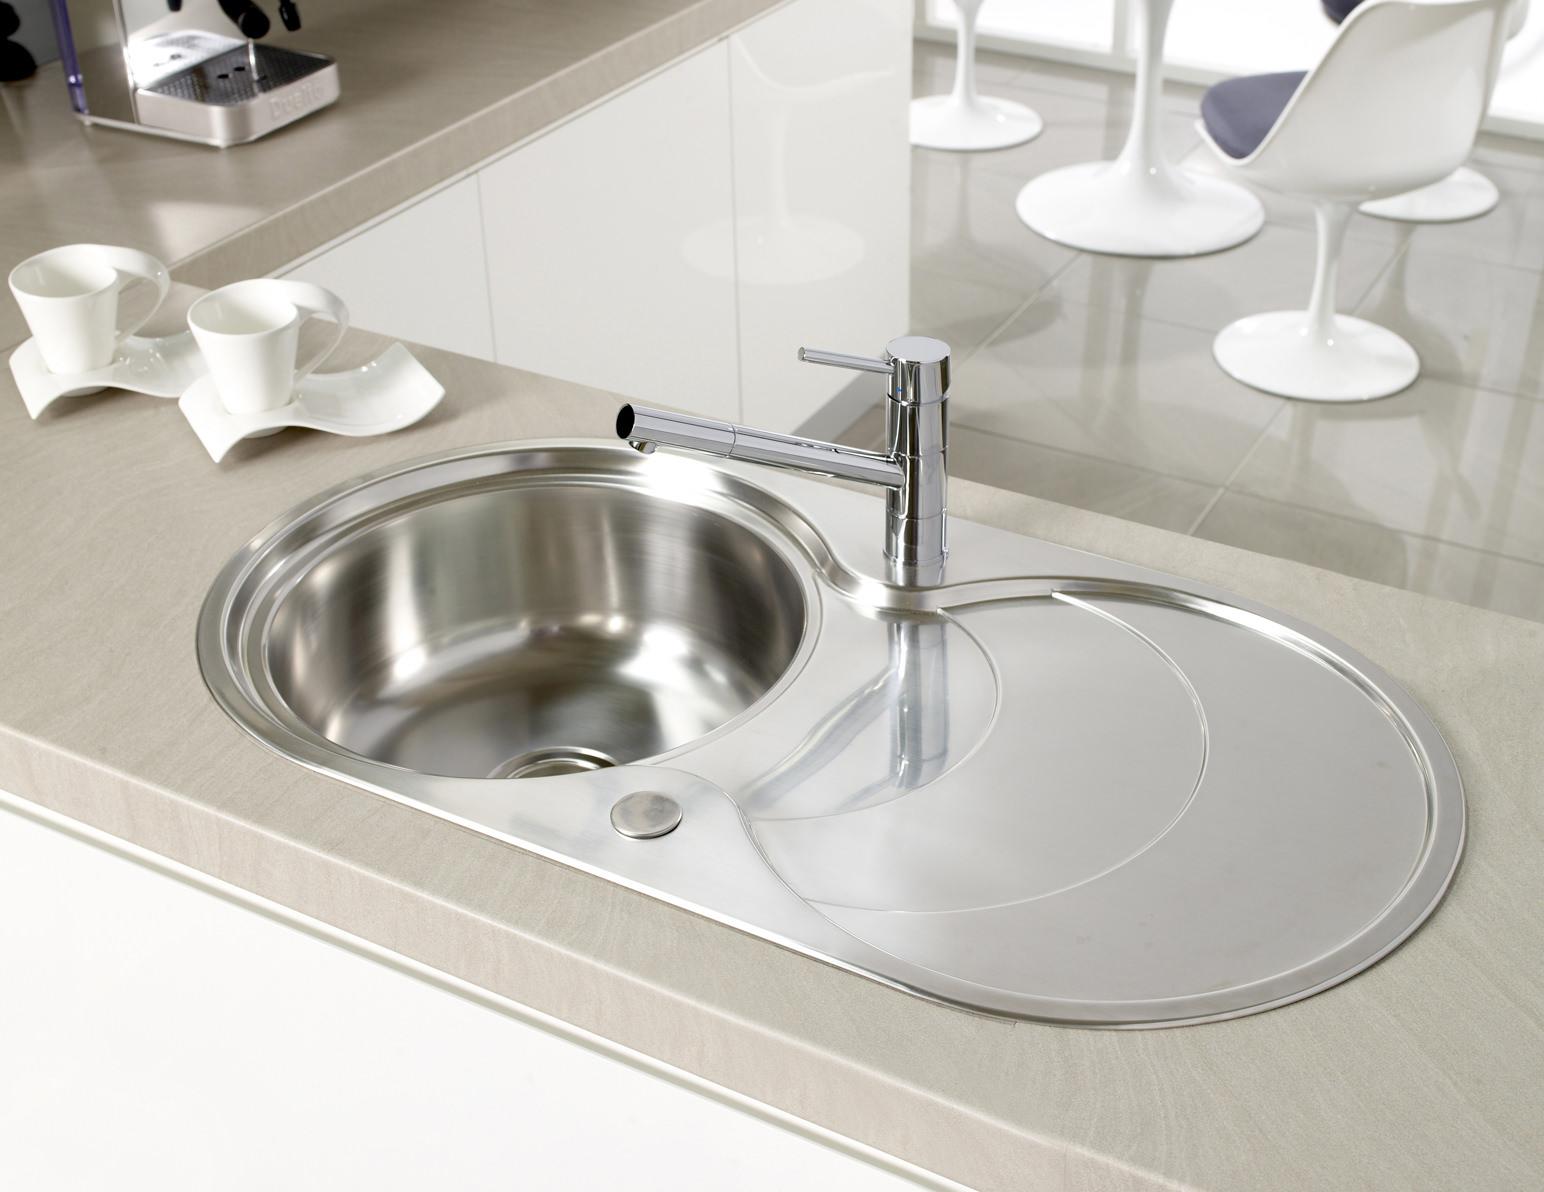 Corner Kitchen Sinks India 100 Bathroom Sink Ideas Bathroom Charming Kohler Sinks With Corner